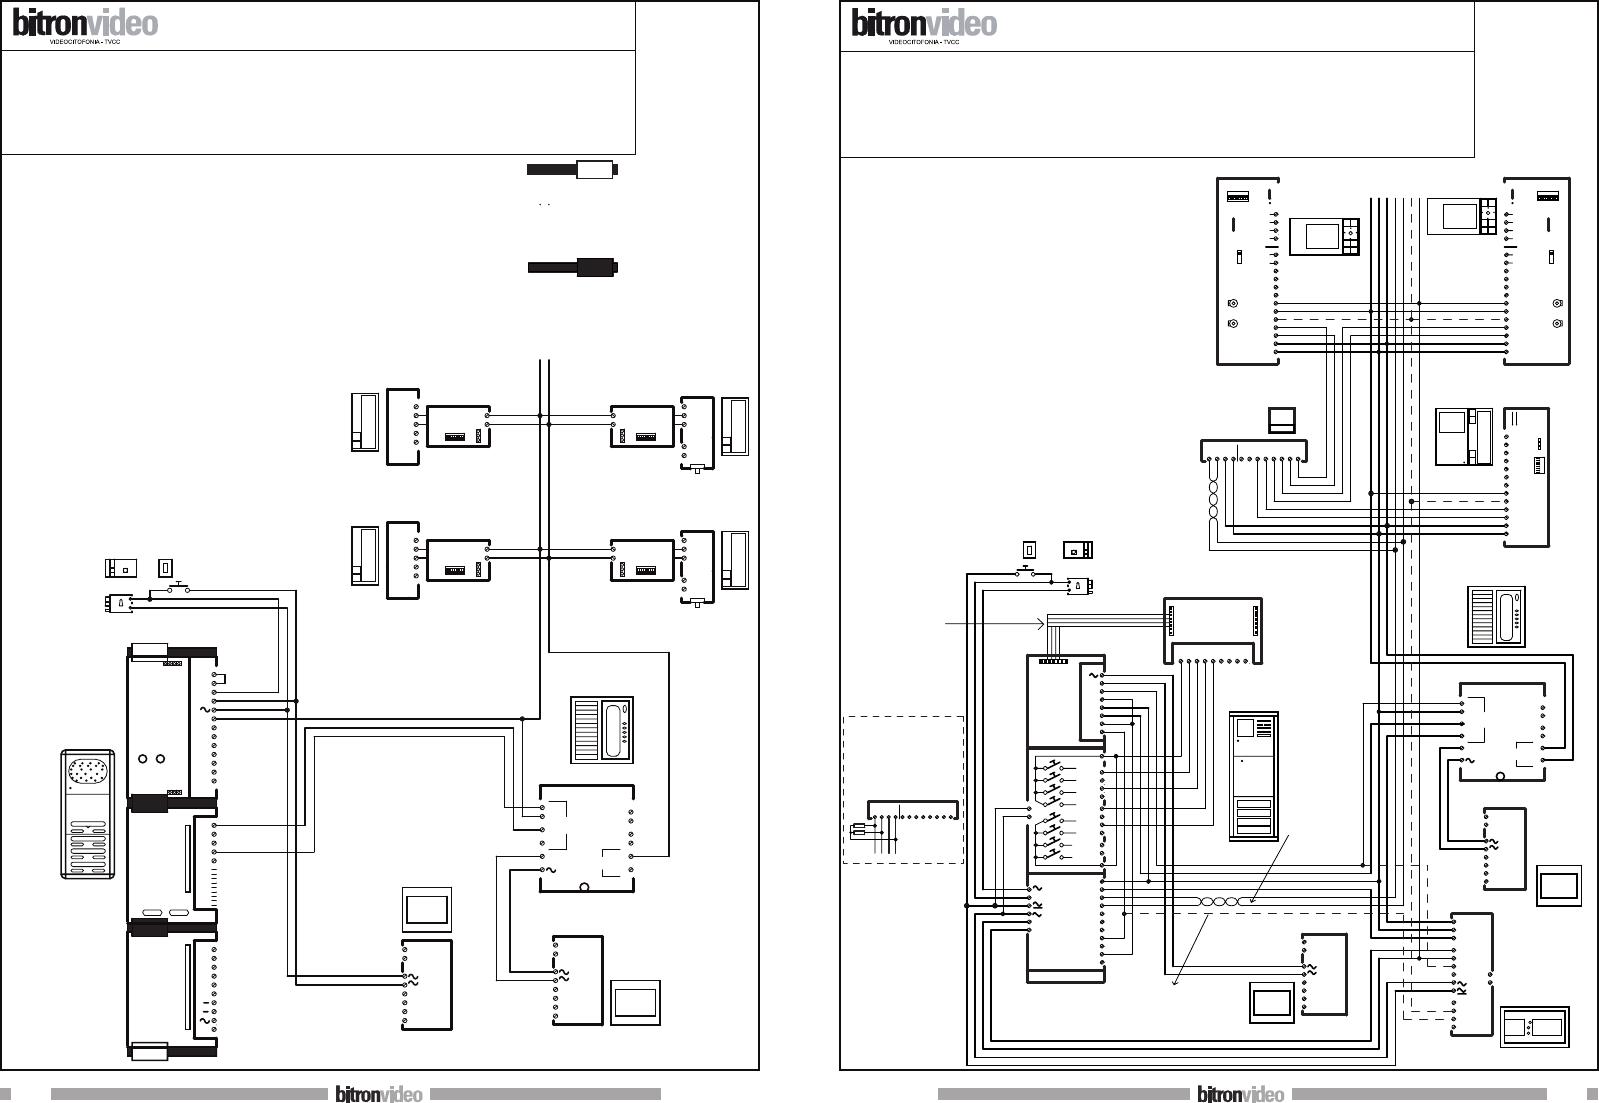 bedienungsanleitung bitron video an9839 lbt90264 seite. Black Bedroom Furniture Sets. Home Design Ideas